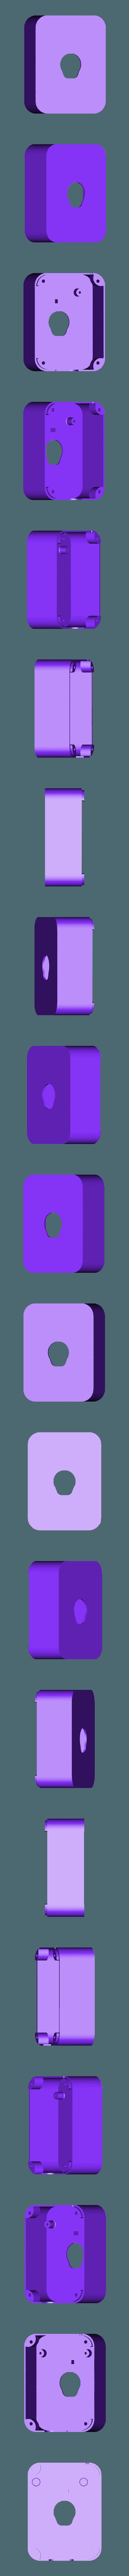 Handbrak_box.stl Download OBJ file USB Rally Handbrake • 3D print template, GoldenBlack